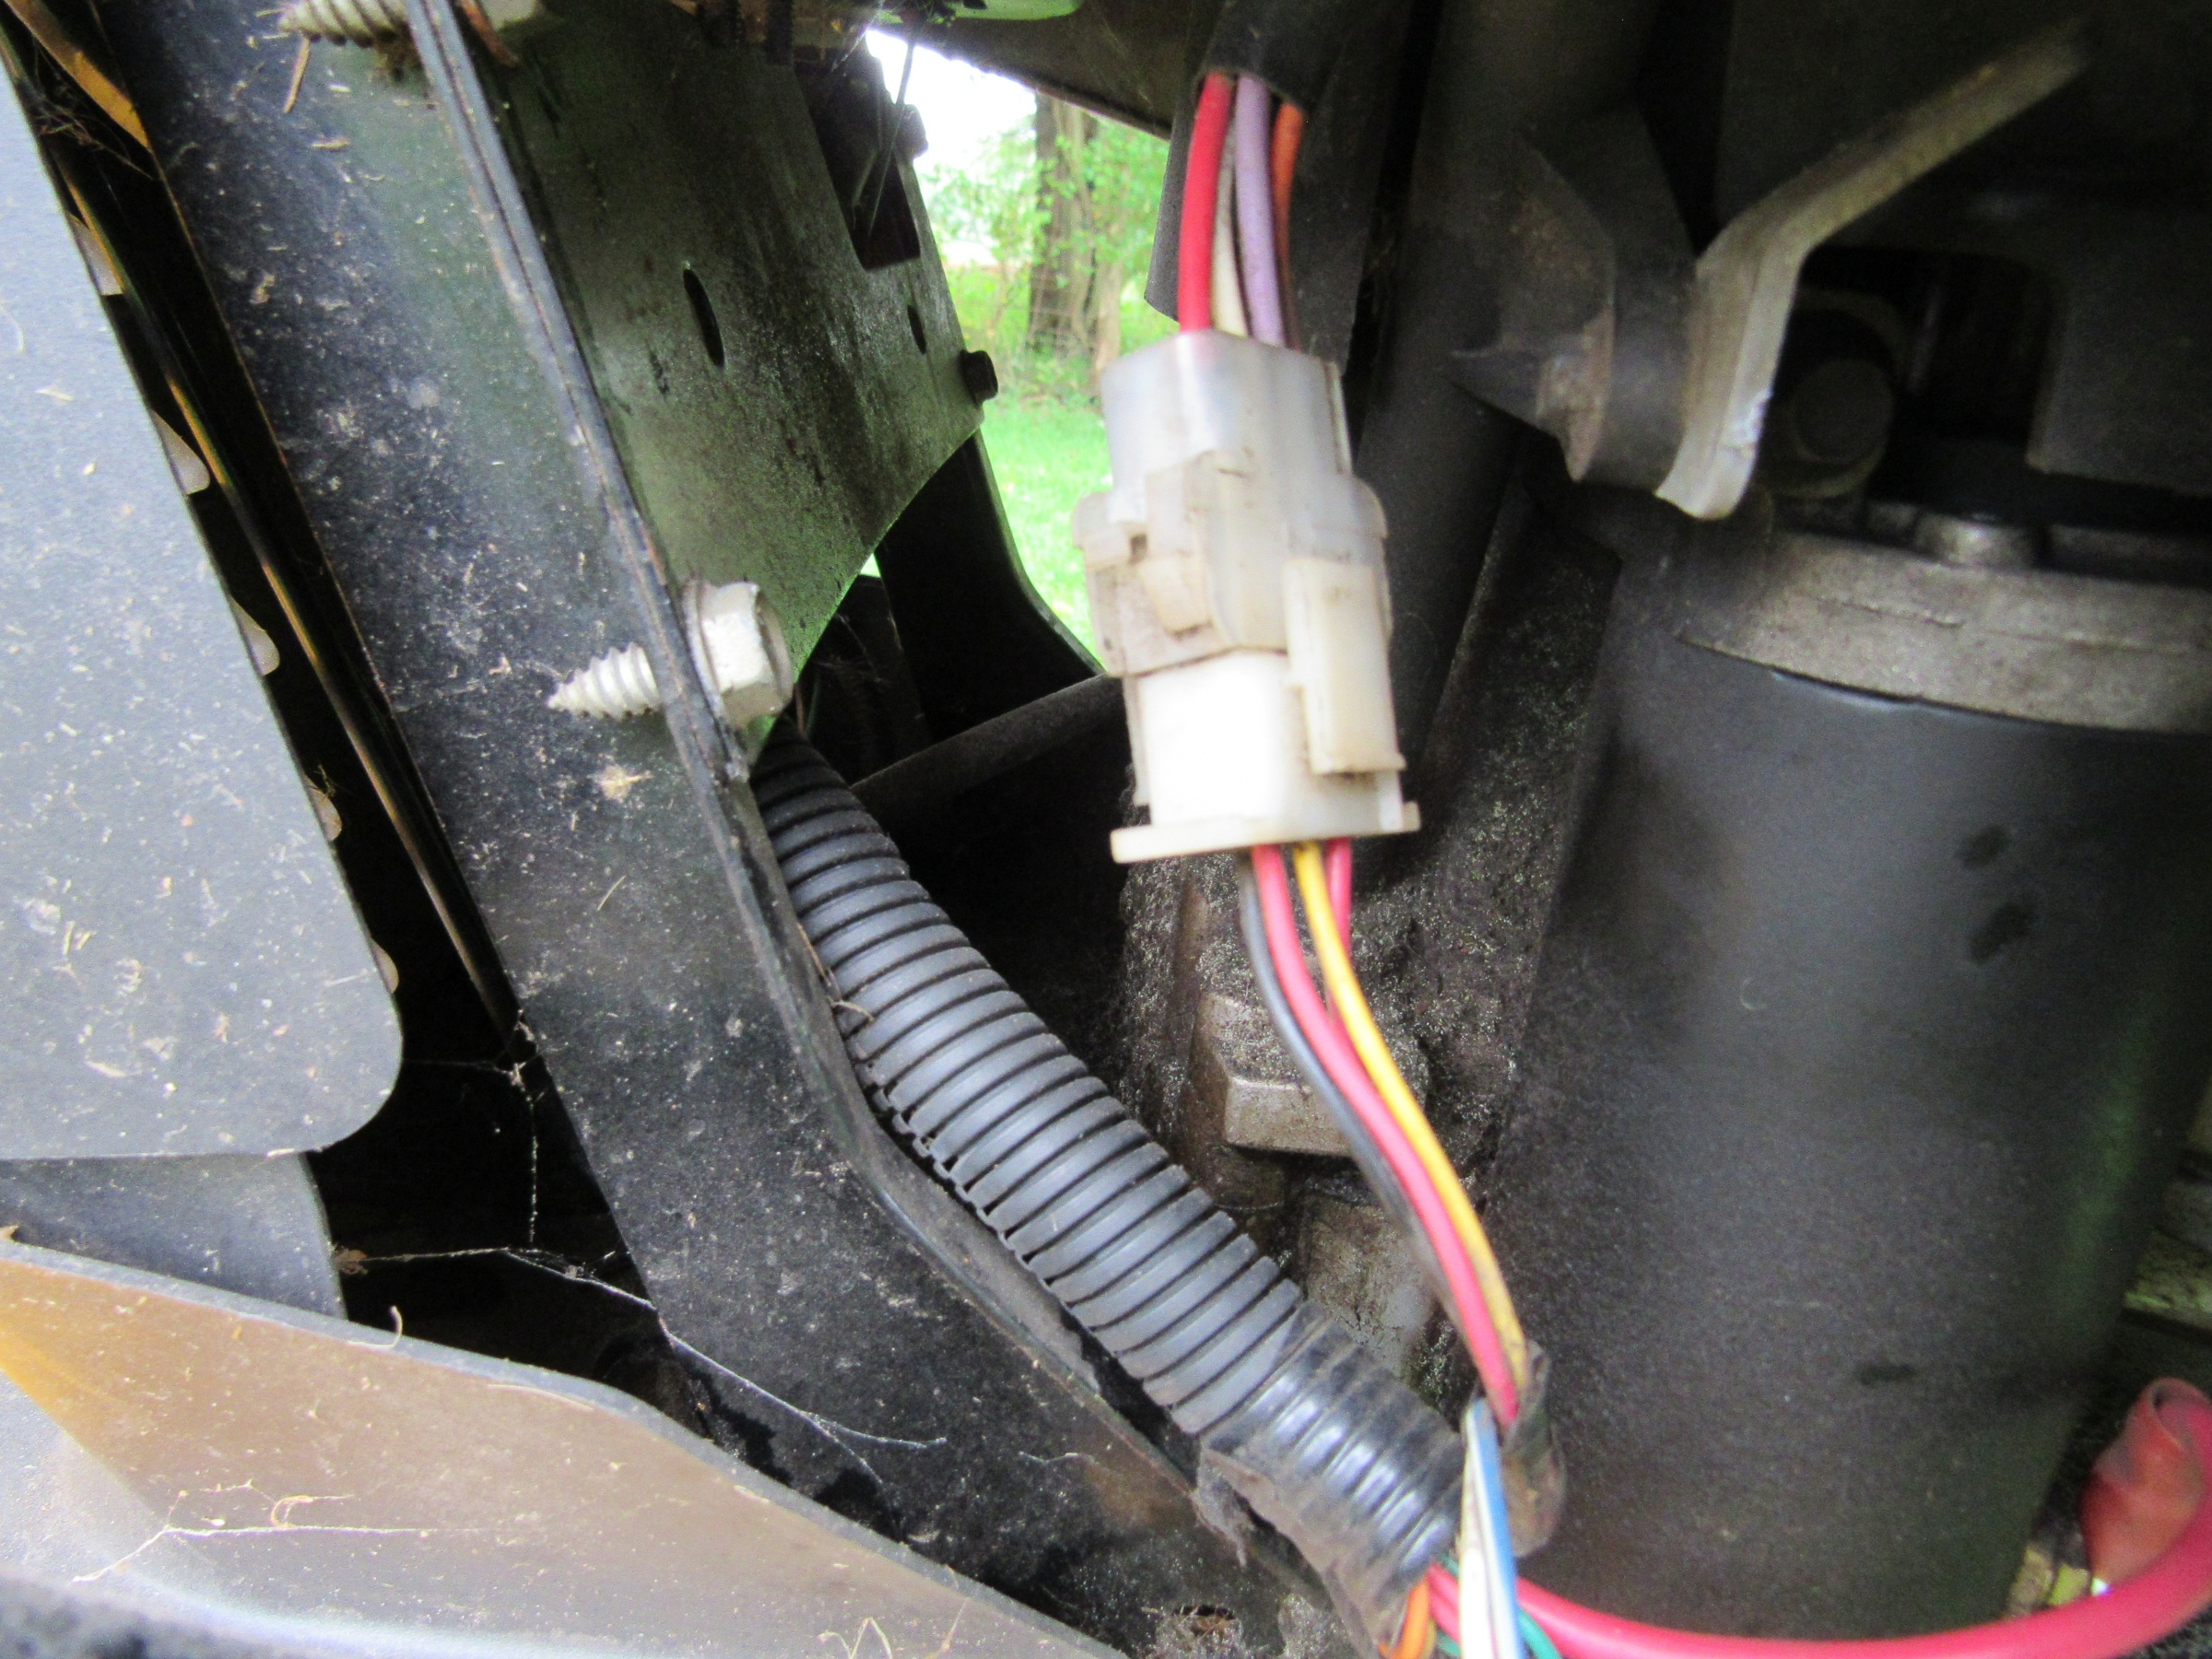 Cub Cadet Lt1045 Pto Issue W Pics Tractors Mowers Diy Wiring Diagram Img 4471